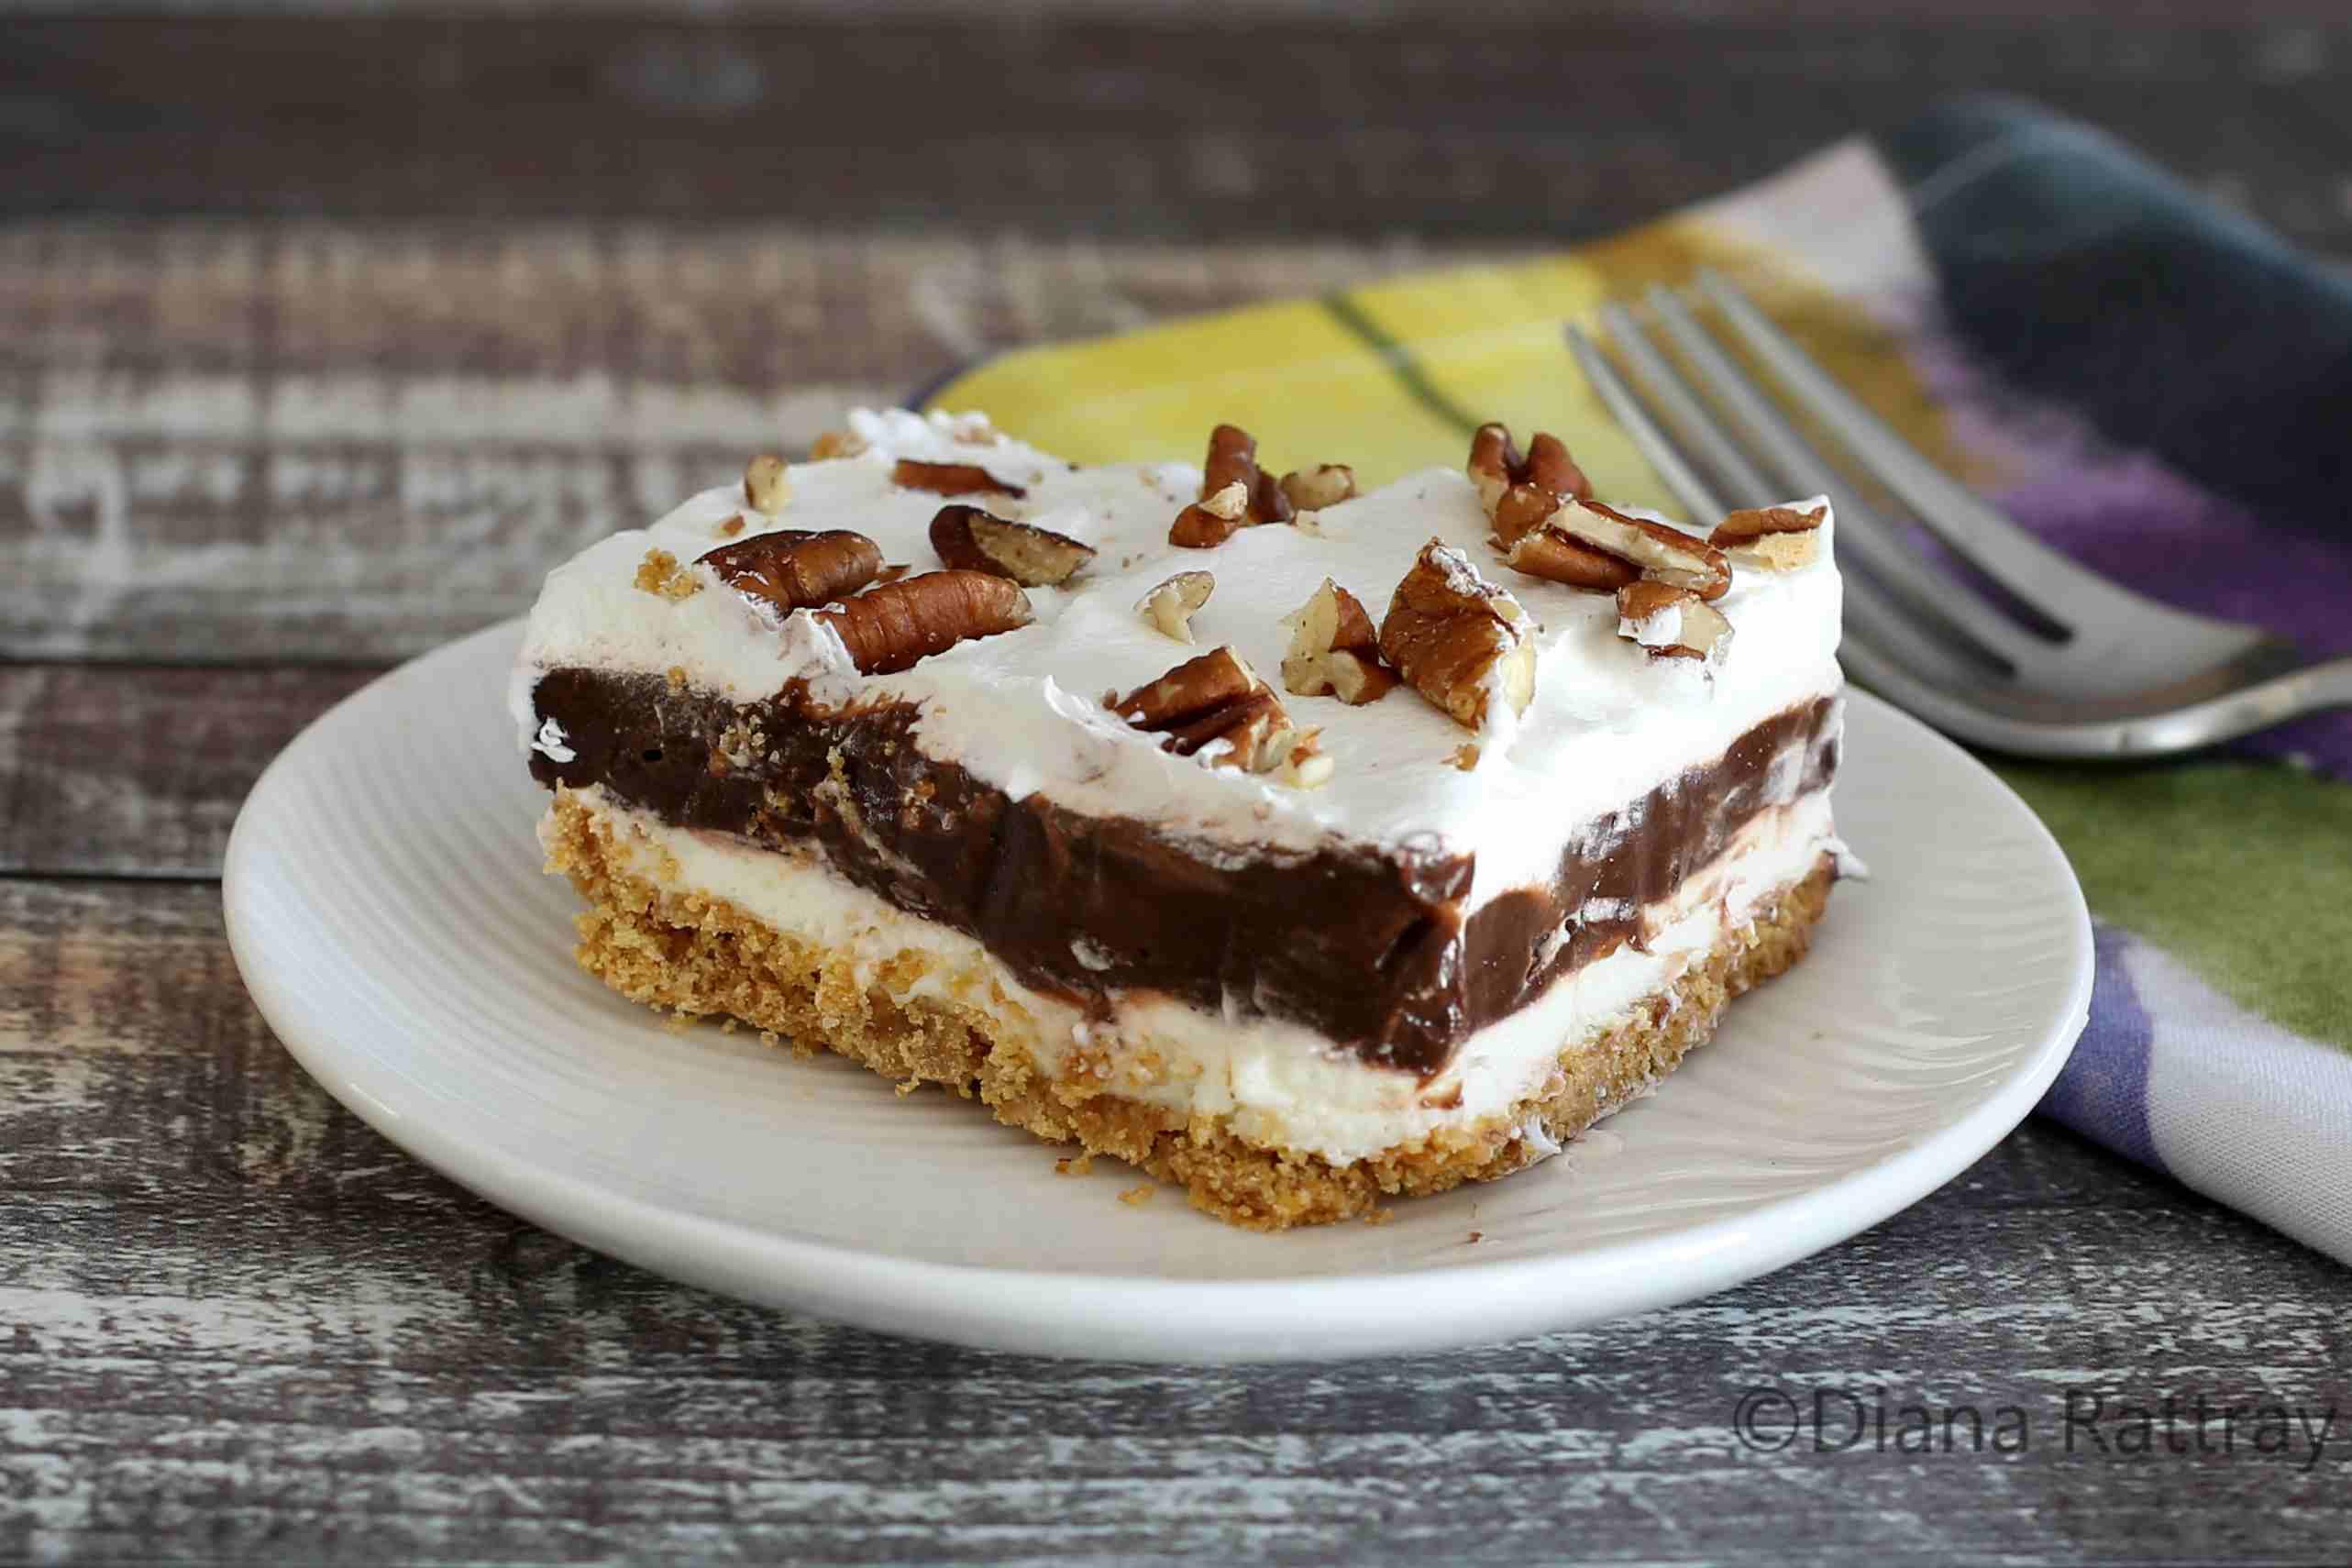 Chocolate Delight Layered Pudding Dessert